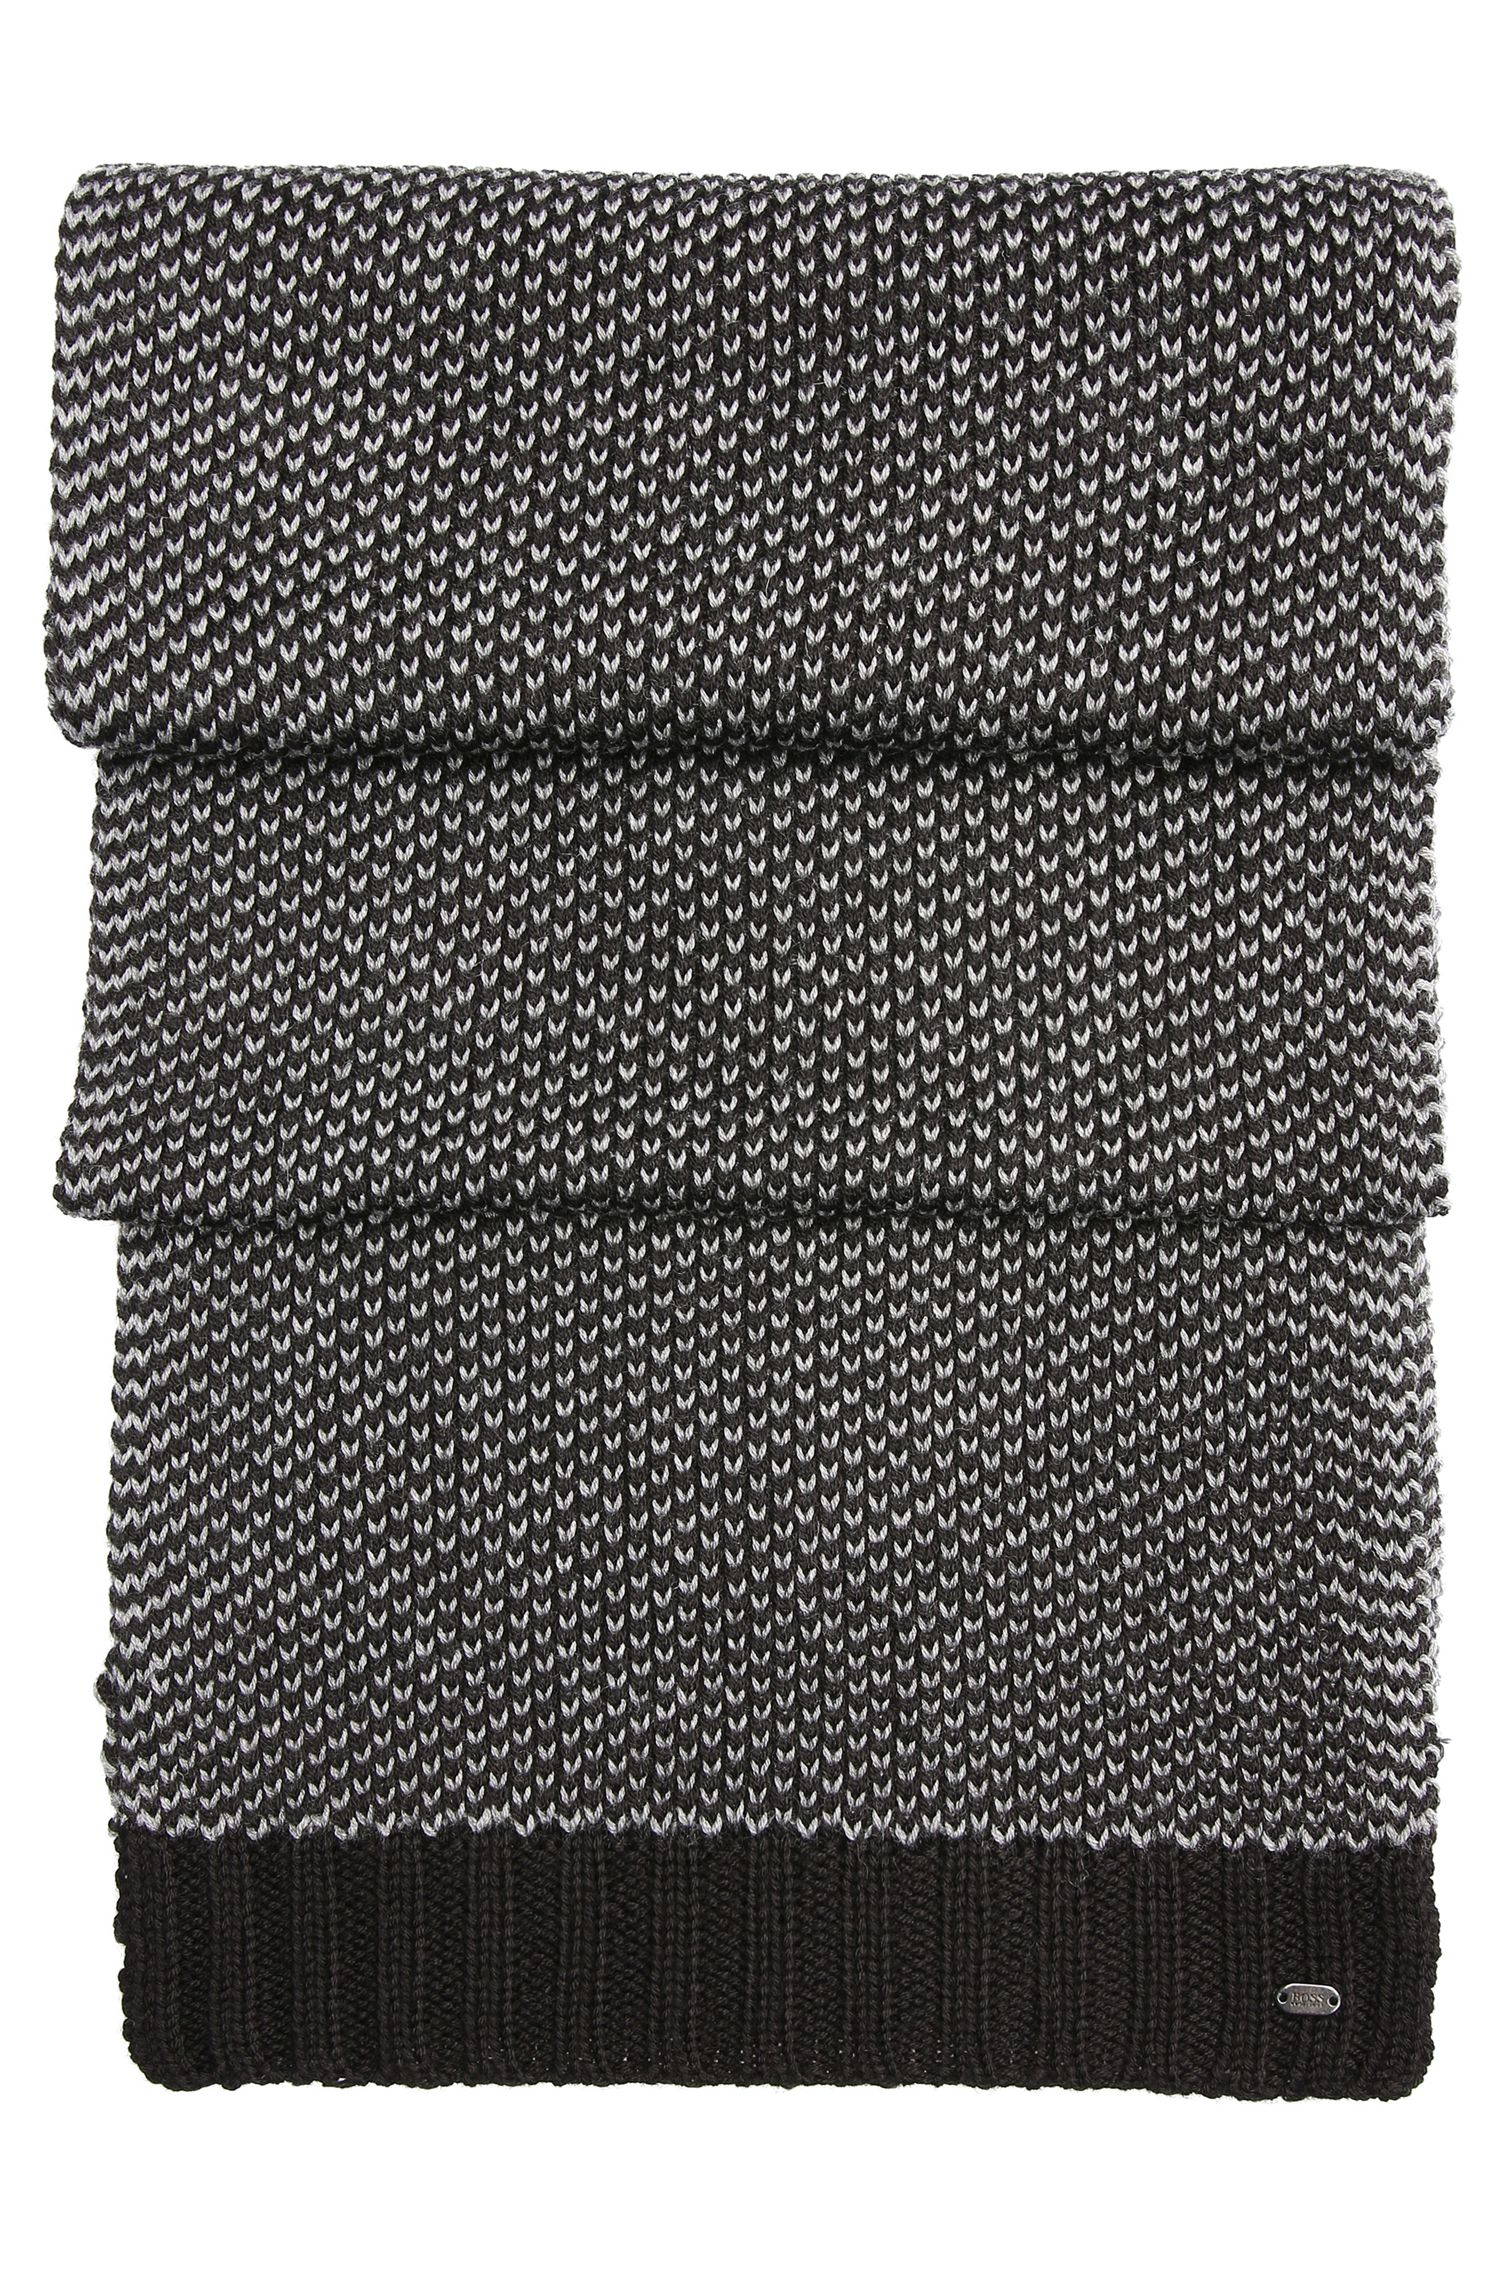 Chal de punto con mezcla de lana: 'Birdseye-Scarf'